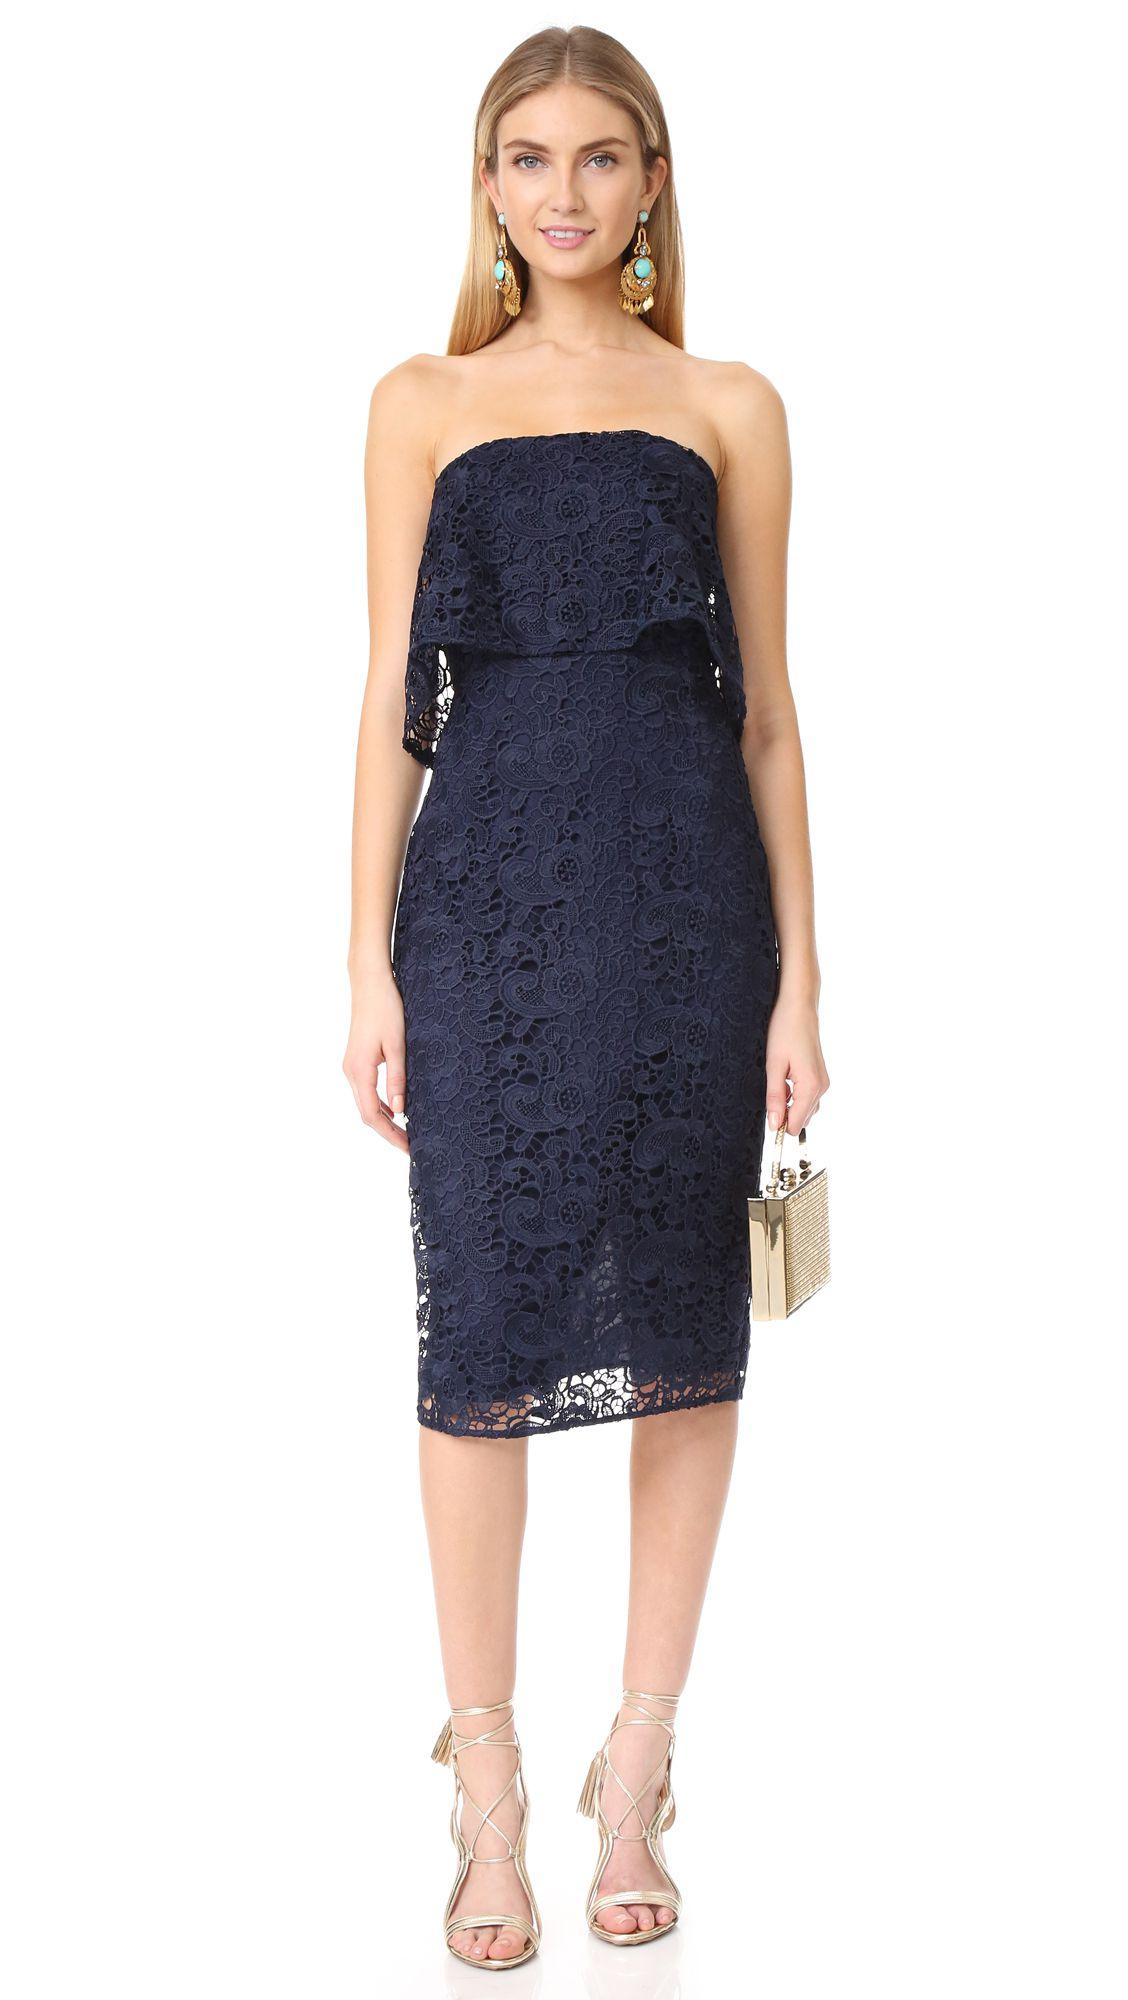 A model wearing a navy blue lace dress